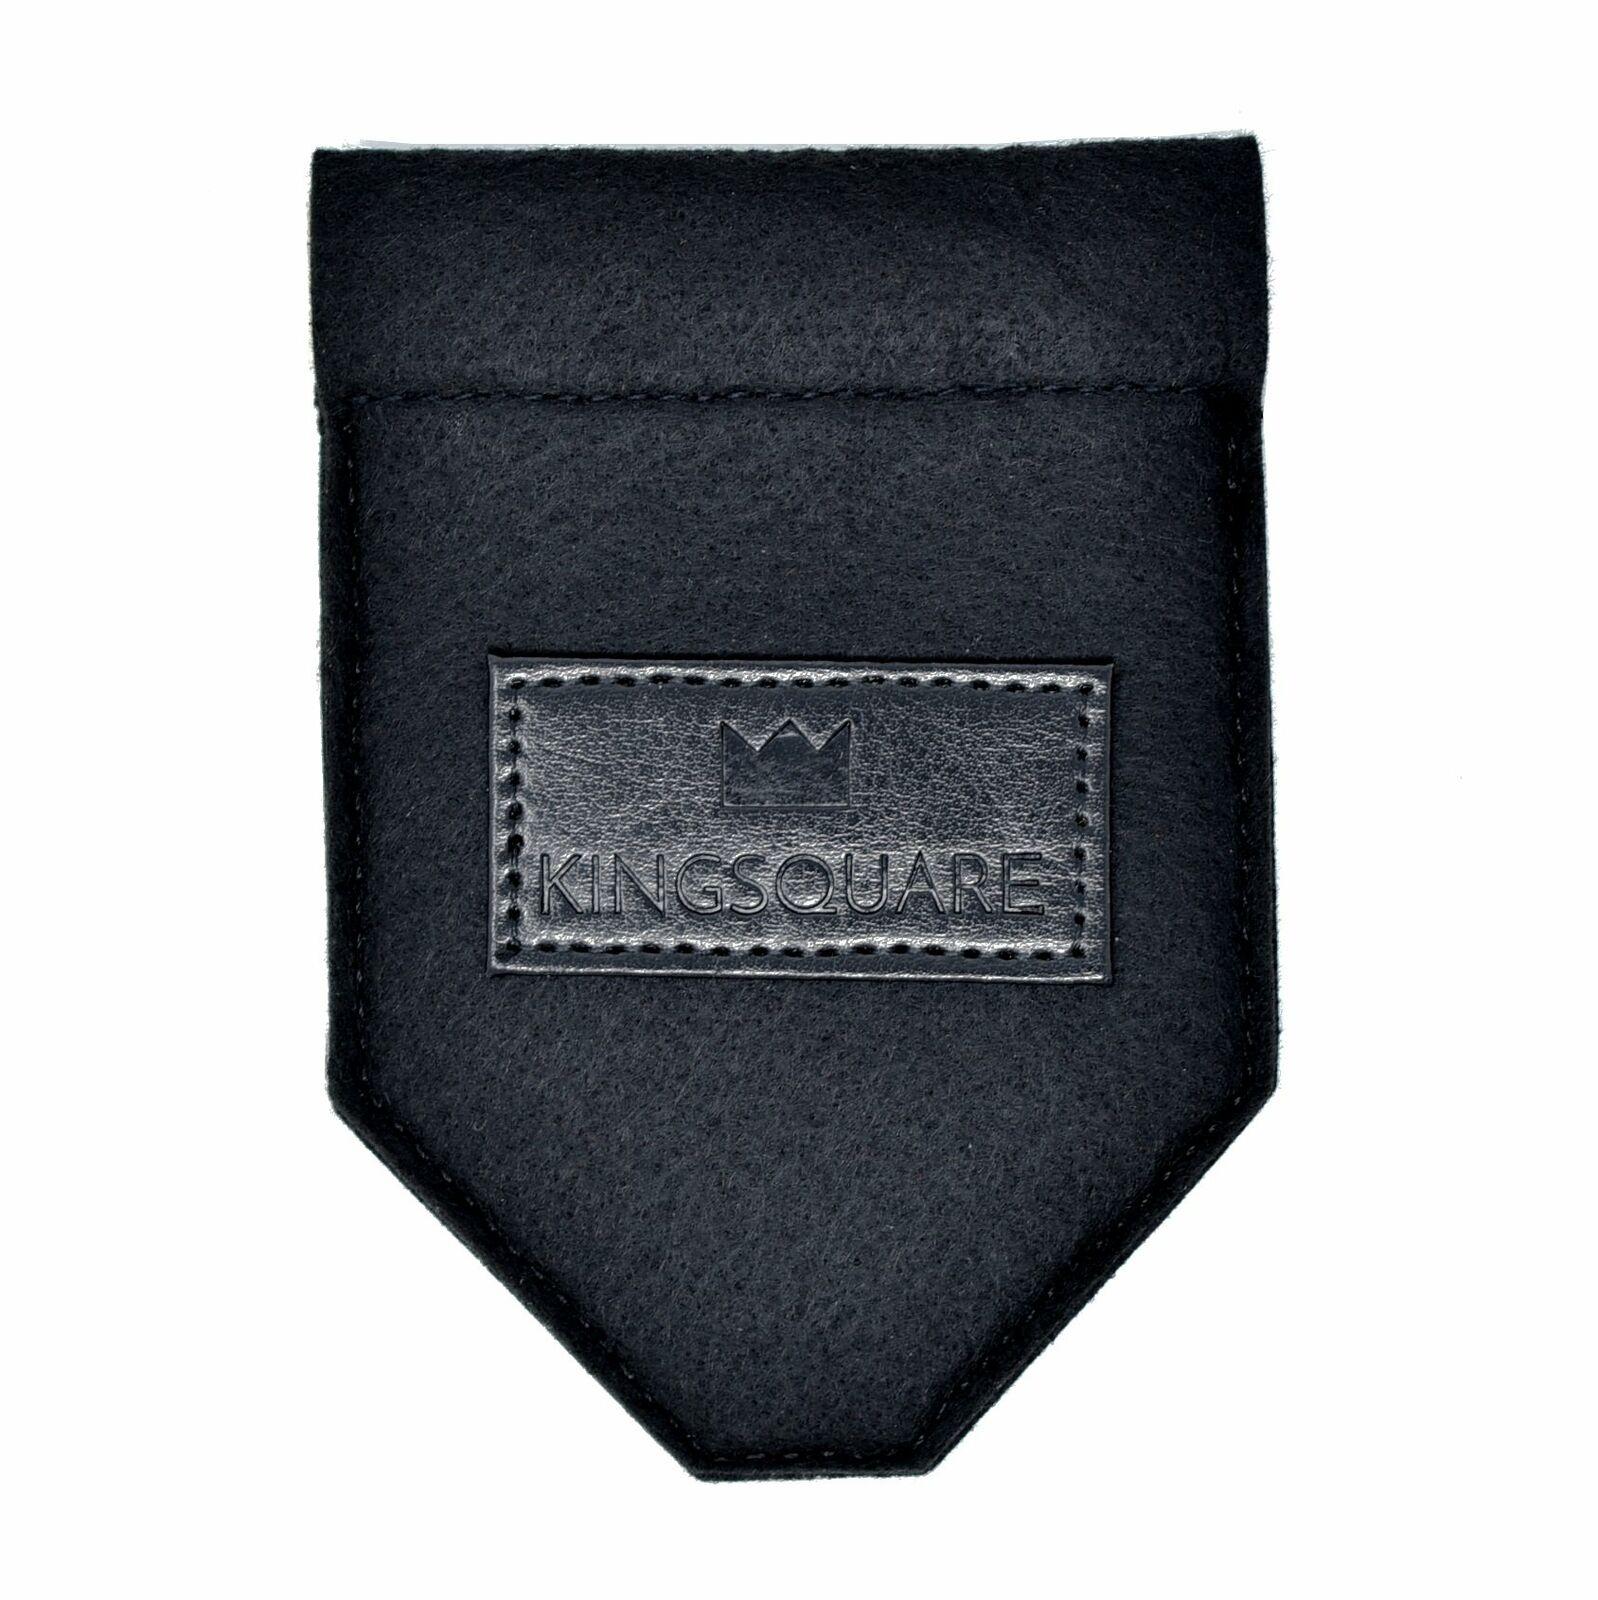 Kingsquare Exclusive Pocket Square Holder- Men's Suit/Blazer/Coat Pocket Square